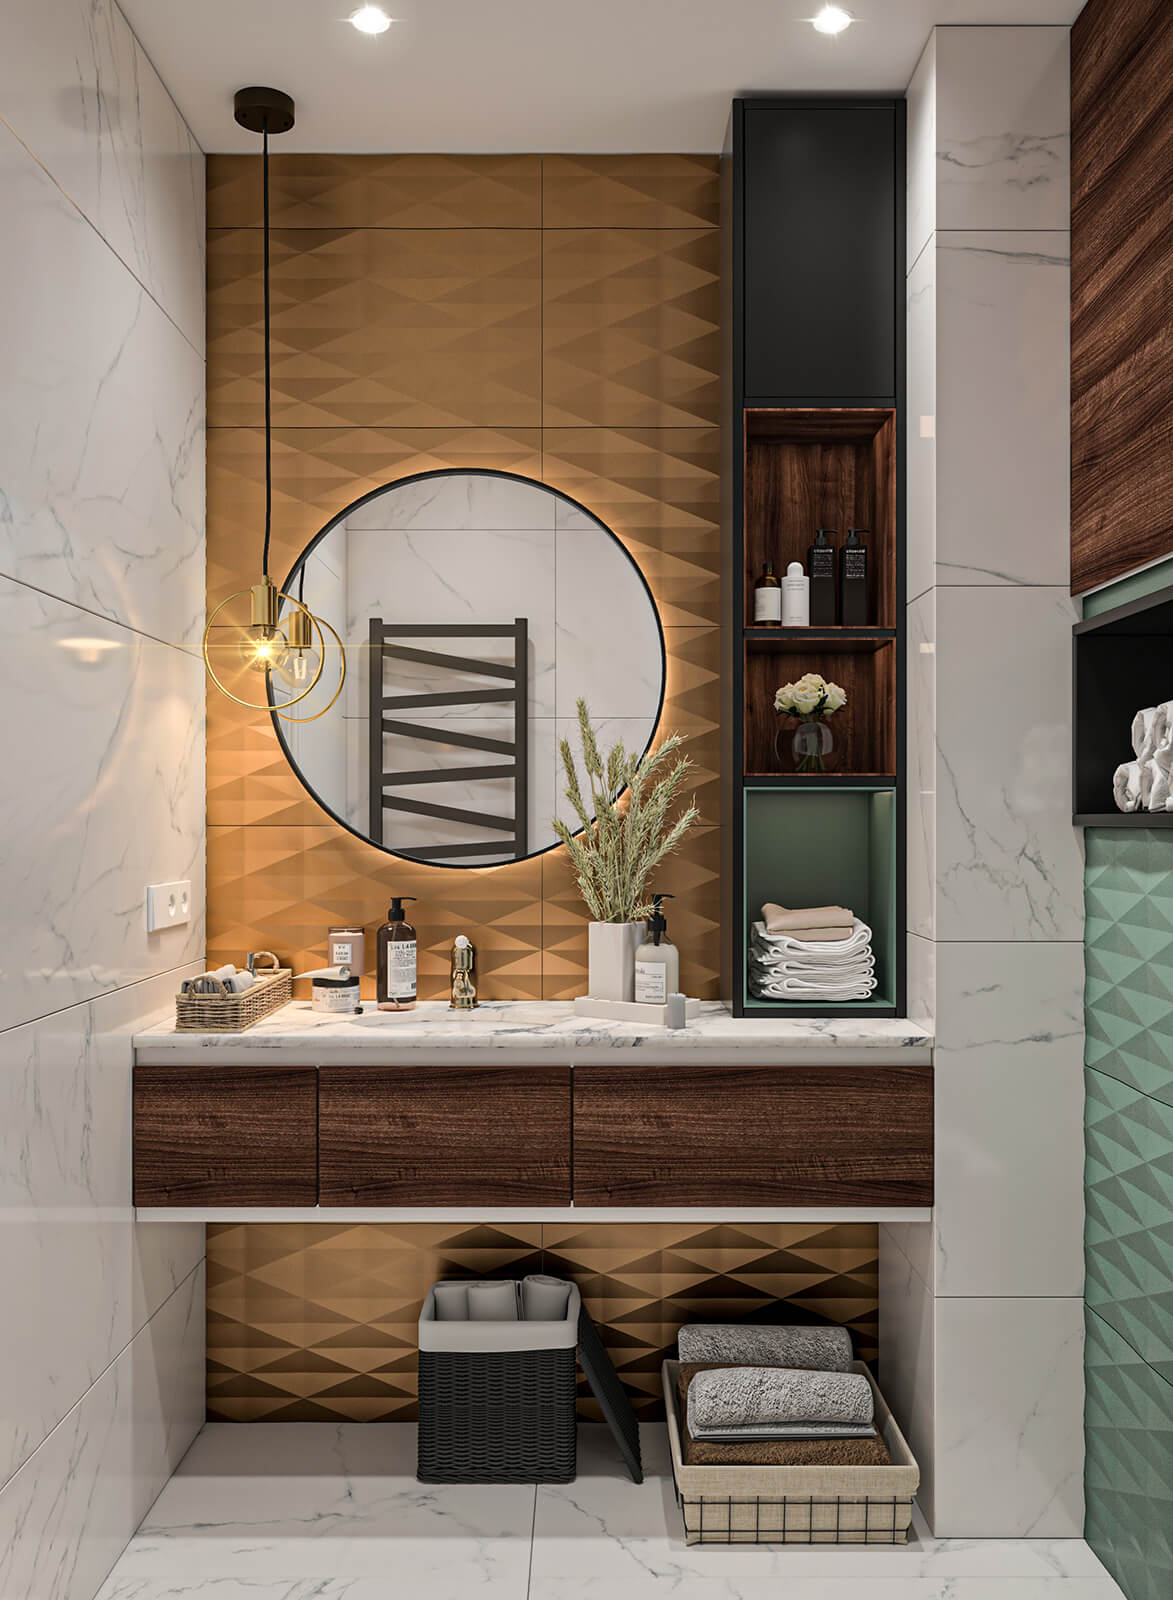 interioren-dizain-proekt-na-malka-banya-emma-1